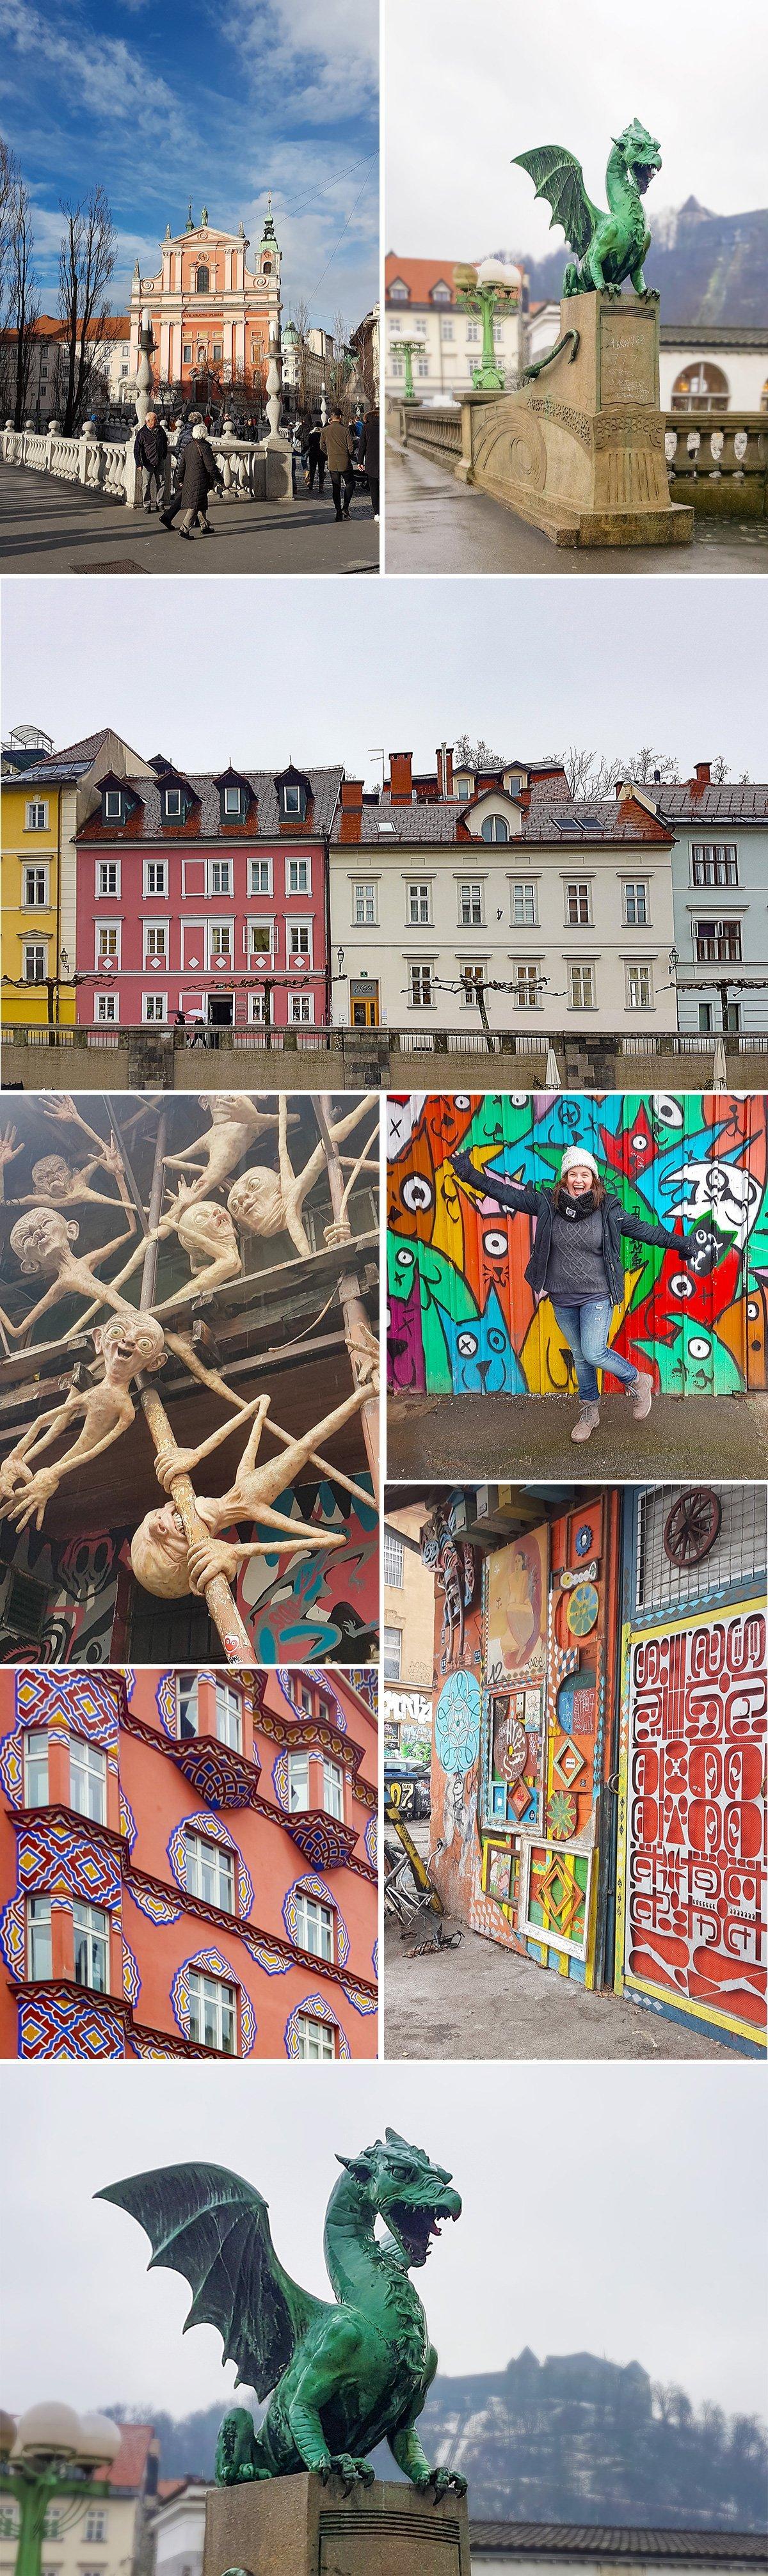 72 Hours In Ljubljana | Little House On The Corner